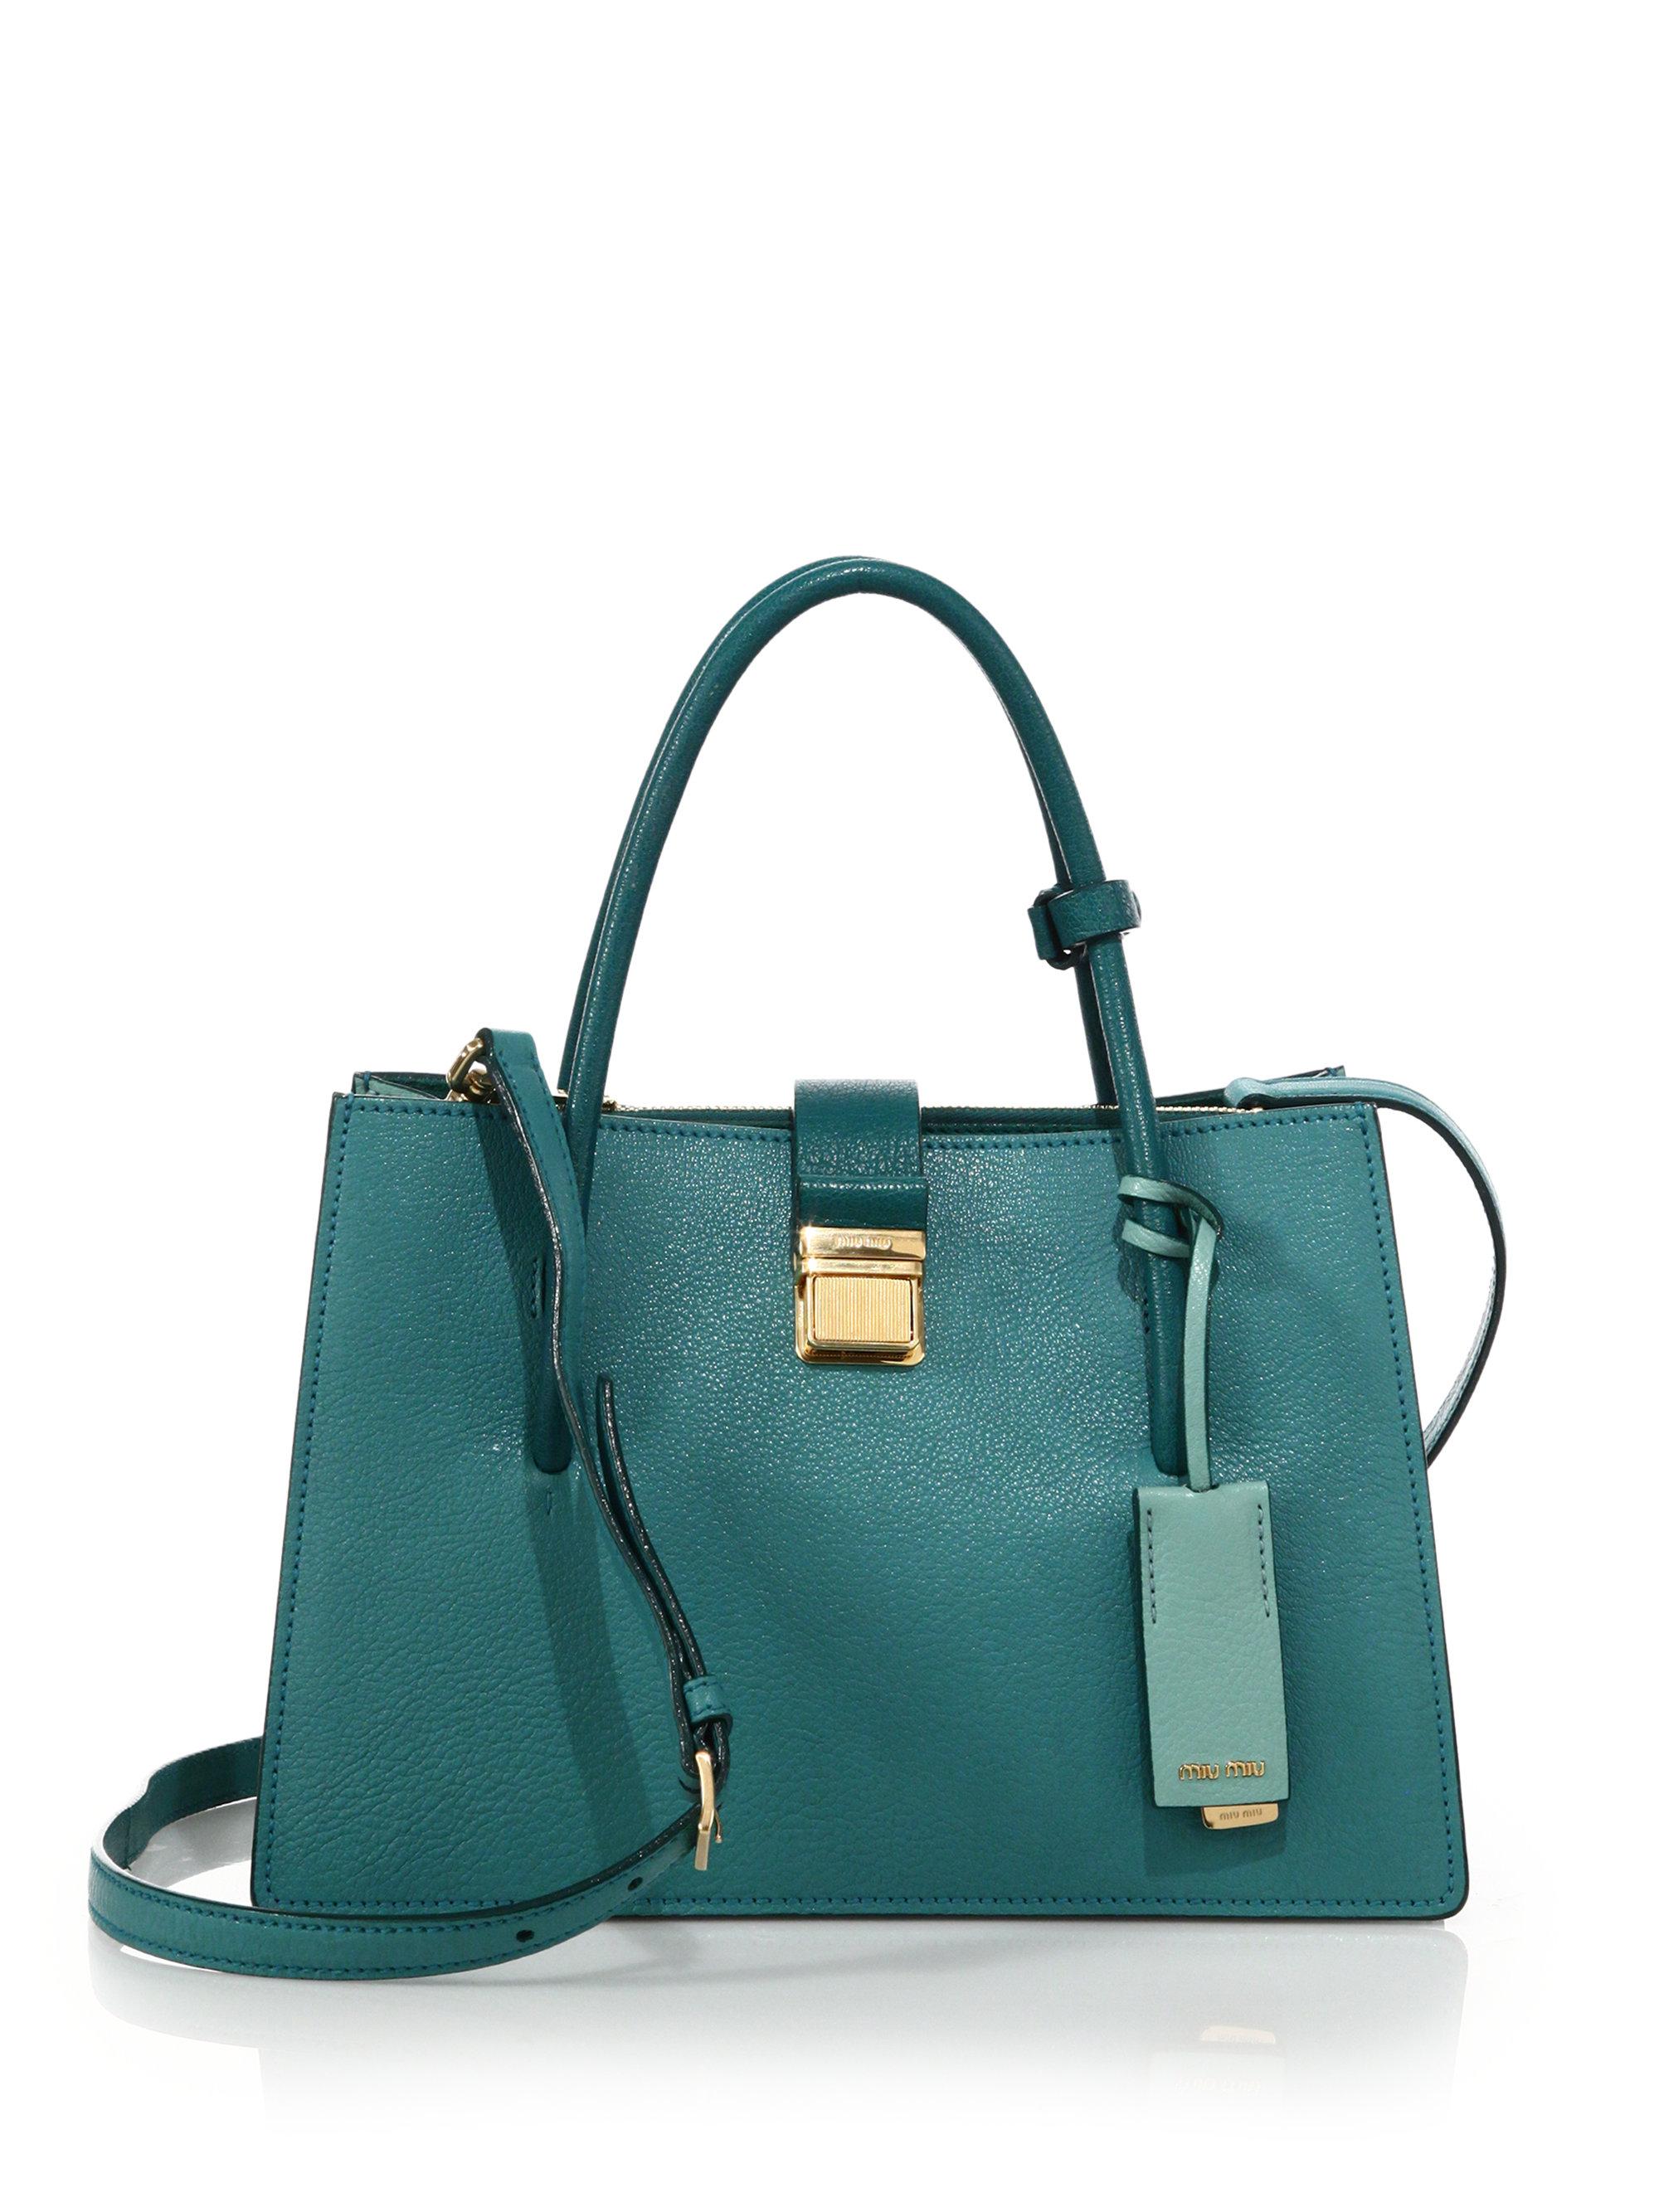 57844668799a Lyst - Miu Miu Madras Small Leather Satchel in Blue